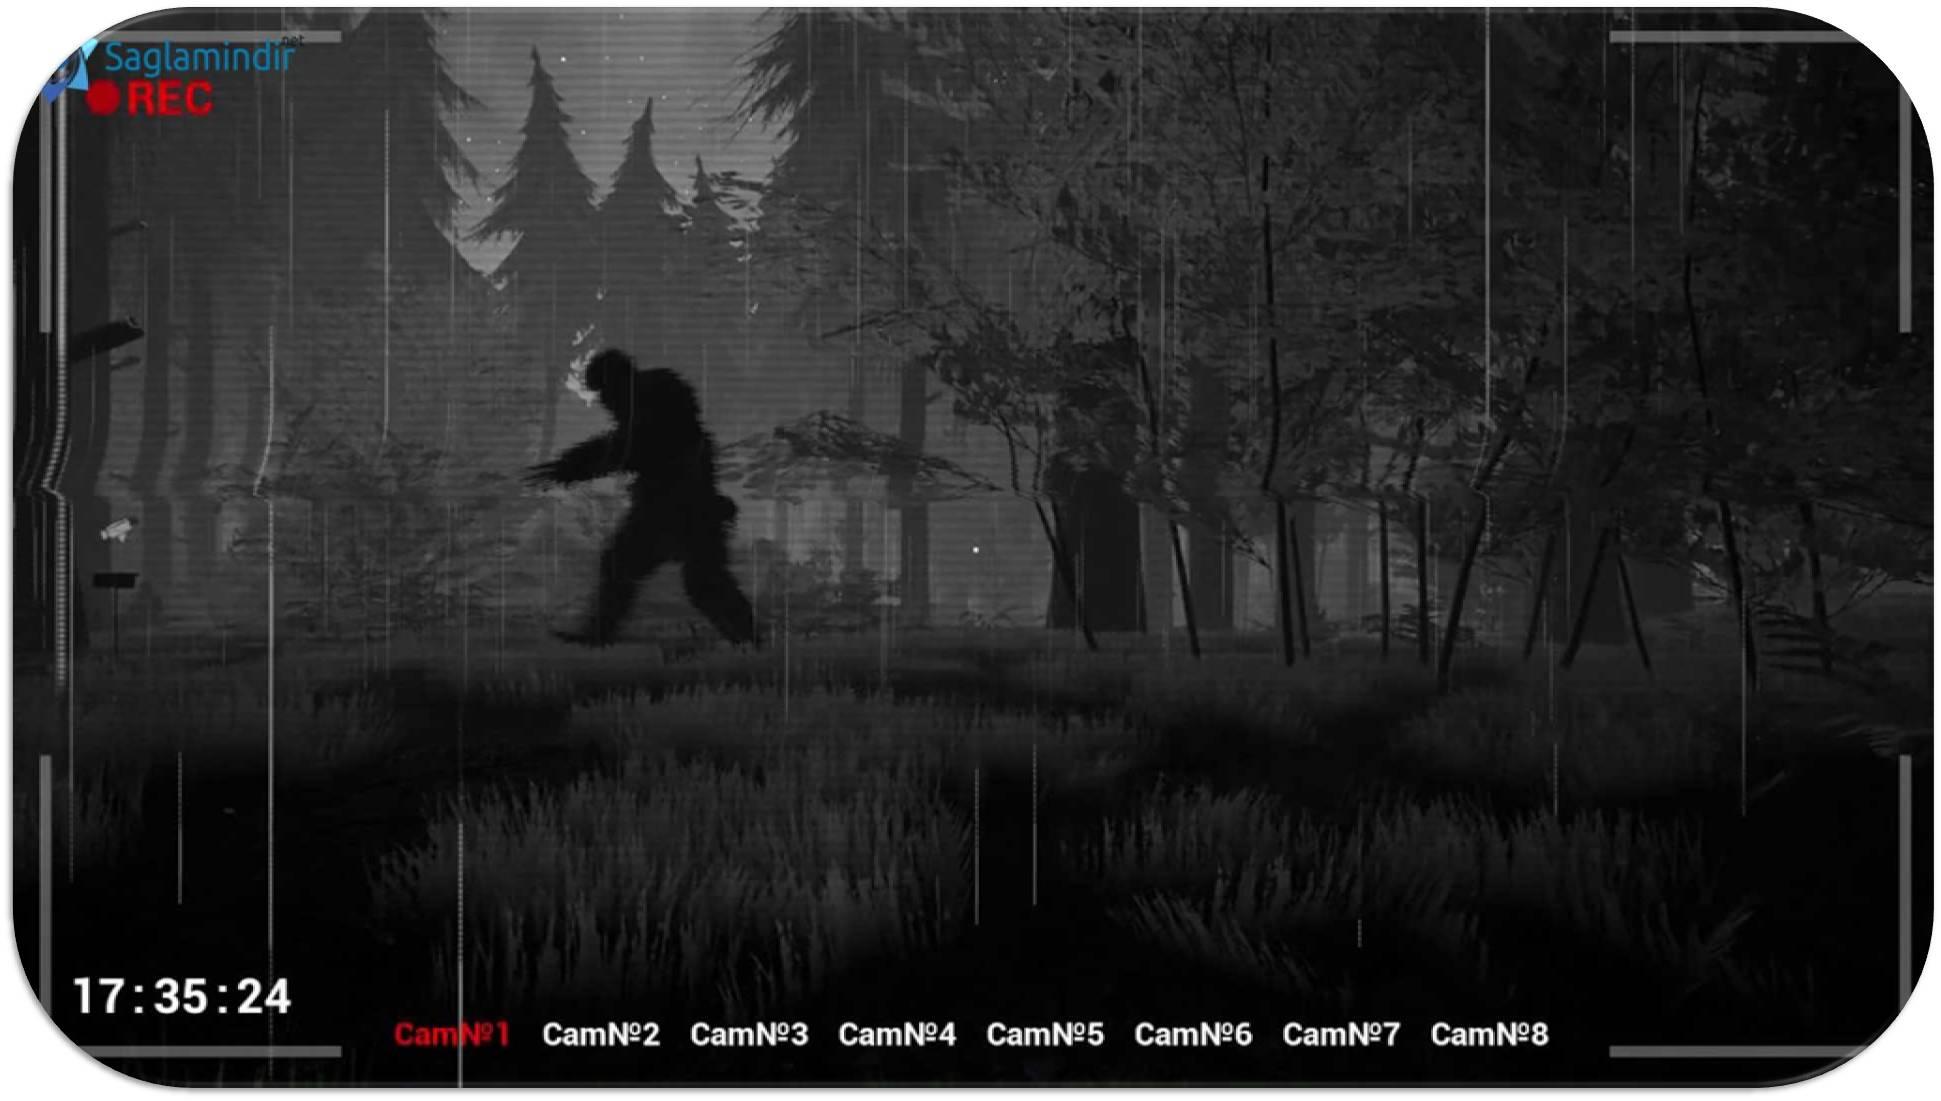 Finding Bigfoot saglamindir